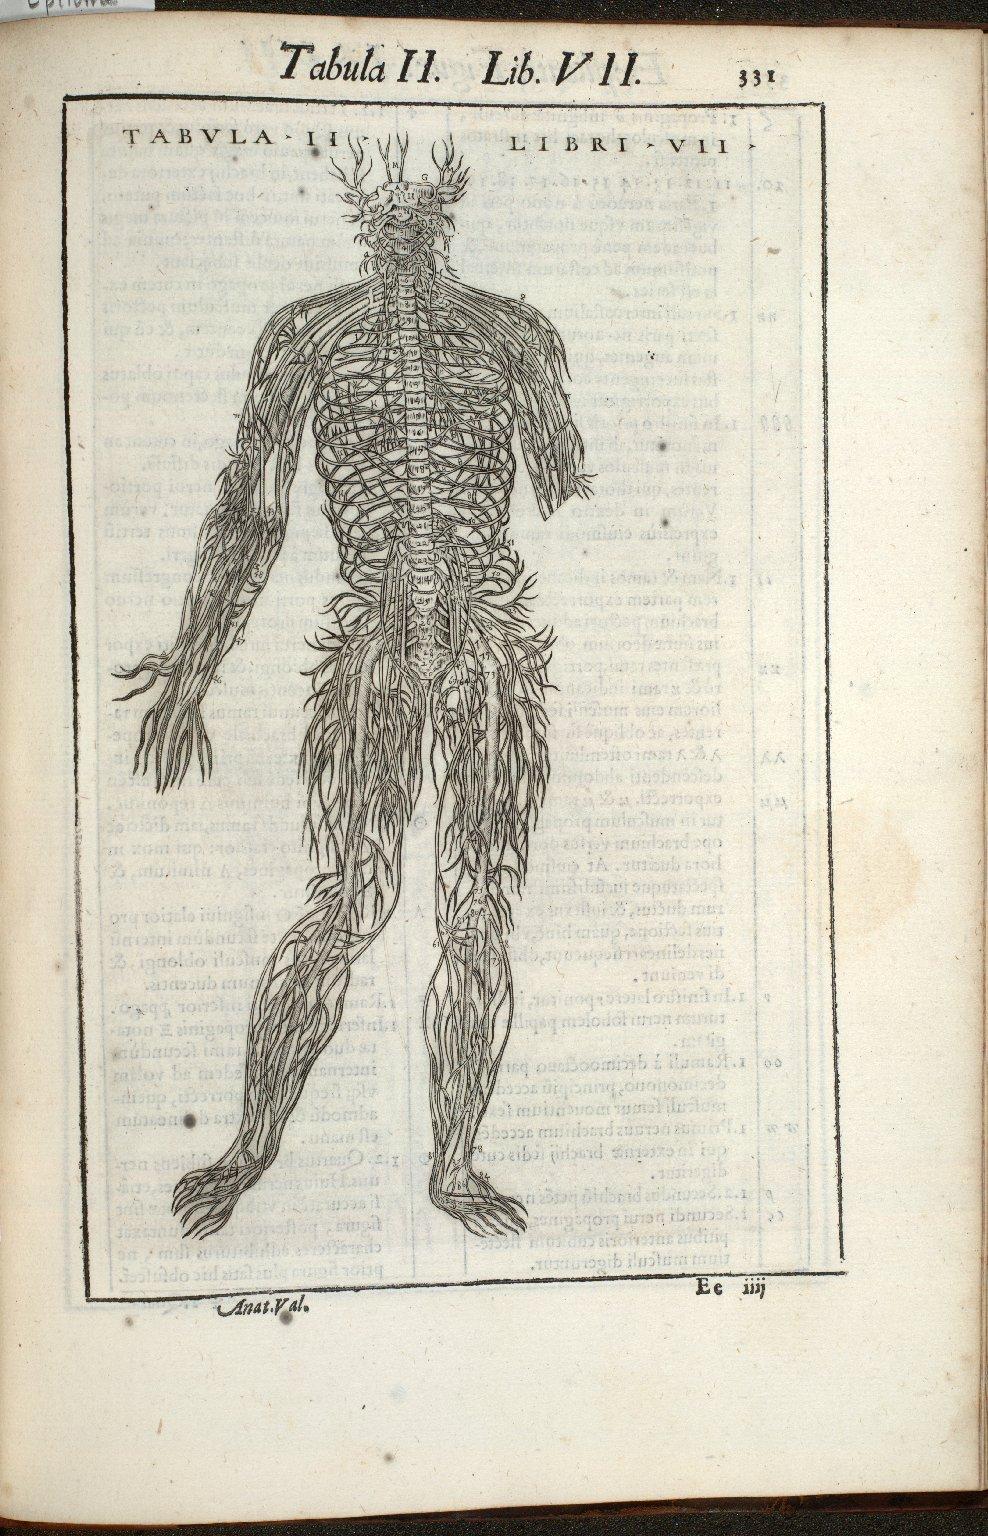 Tabula II. Libri VII.